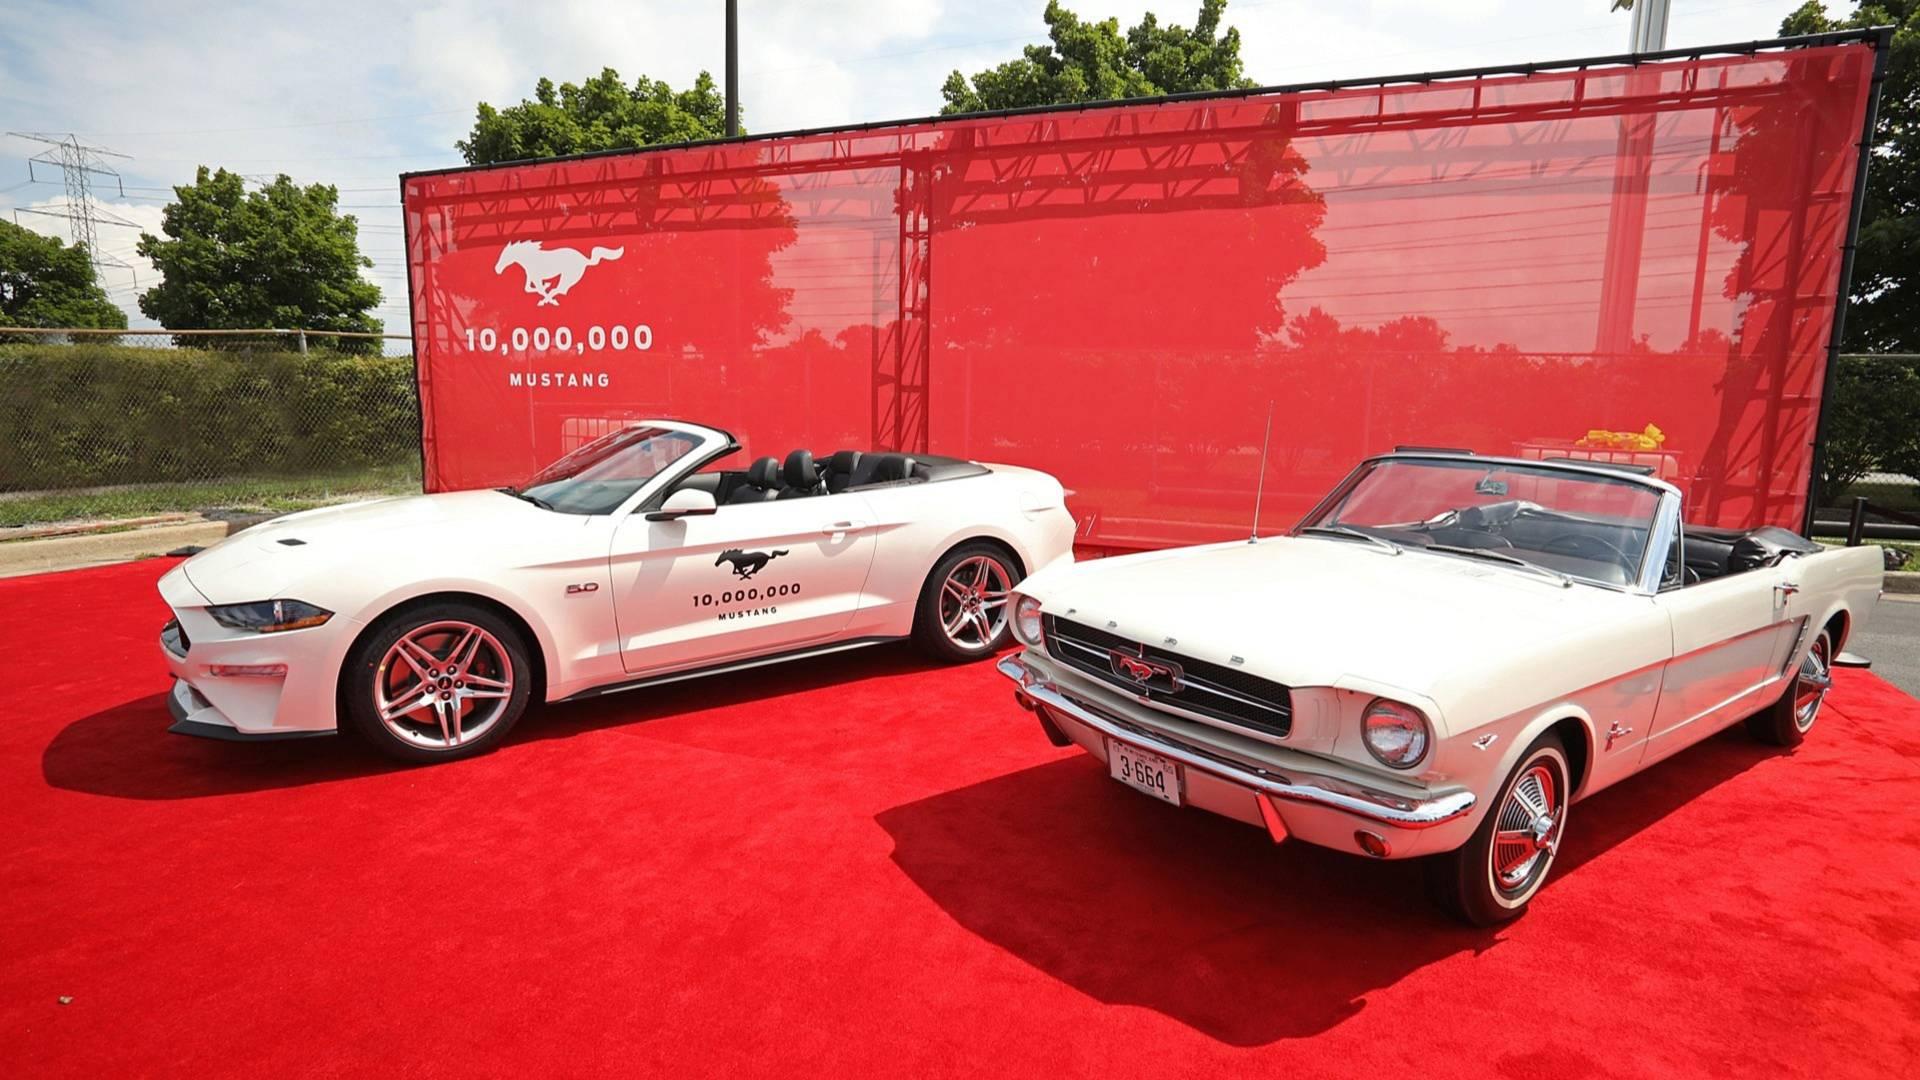 ford mustang 10 million 1 پرفروشترین خودرو اسپرت جهان از بحران کرونا در امان نماند؛ کاهش فروش فورد موستانگ اخبار IT